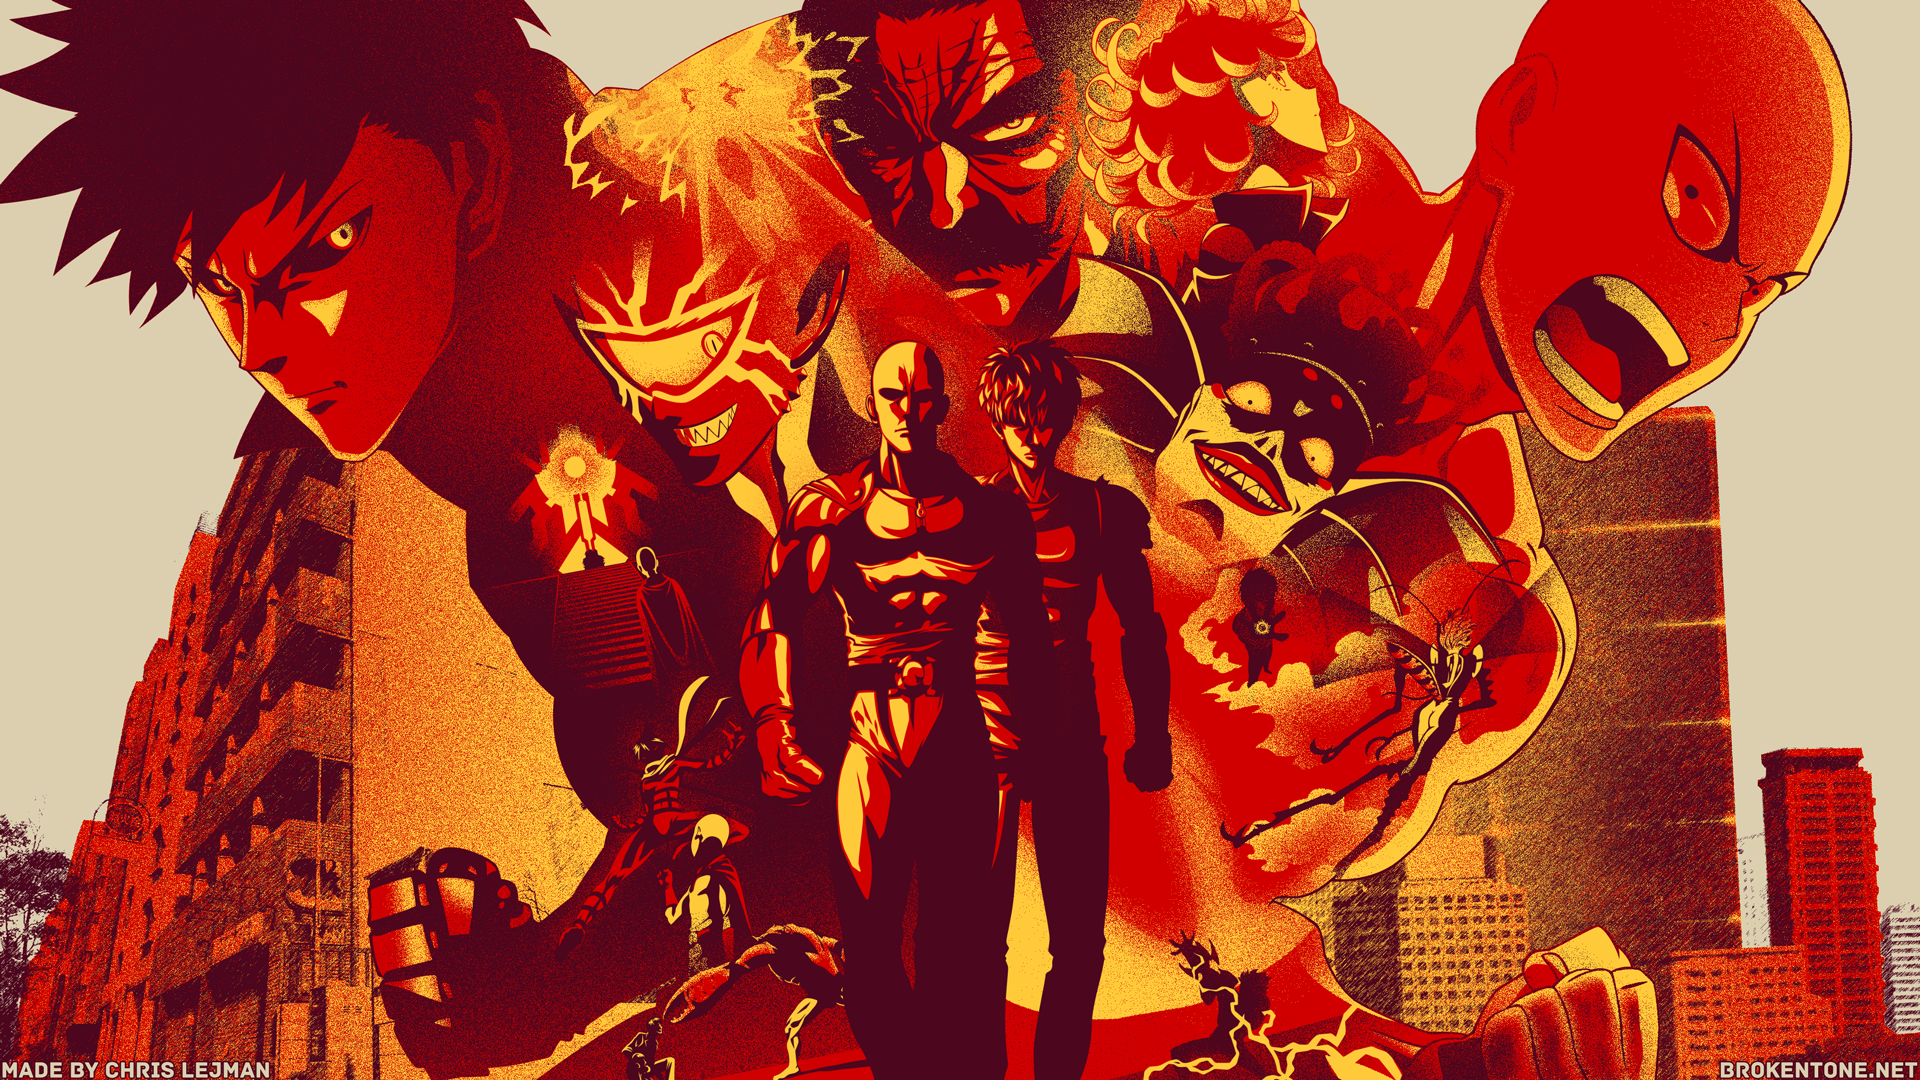 One Punch Man Wallpaper Reddit Anime Wallpaper In 2020 Anime Wallpaper One Punch Man Anime One Punch Man